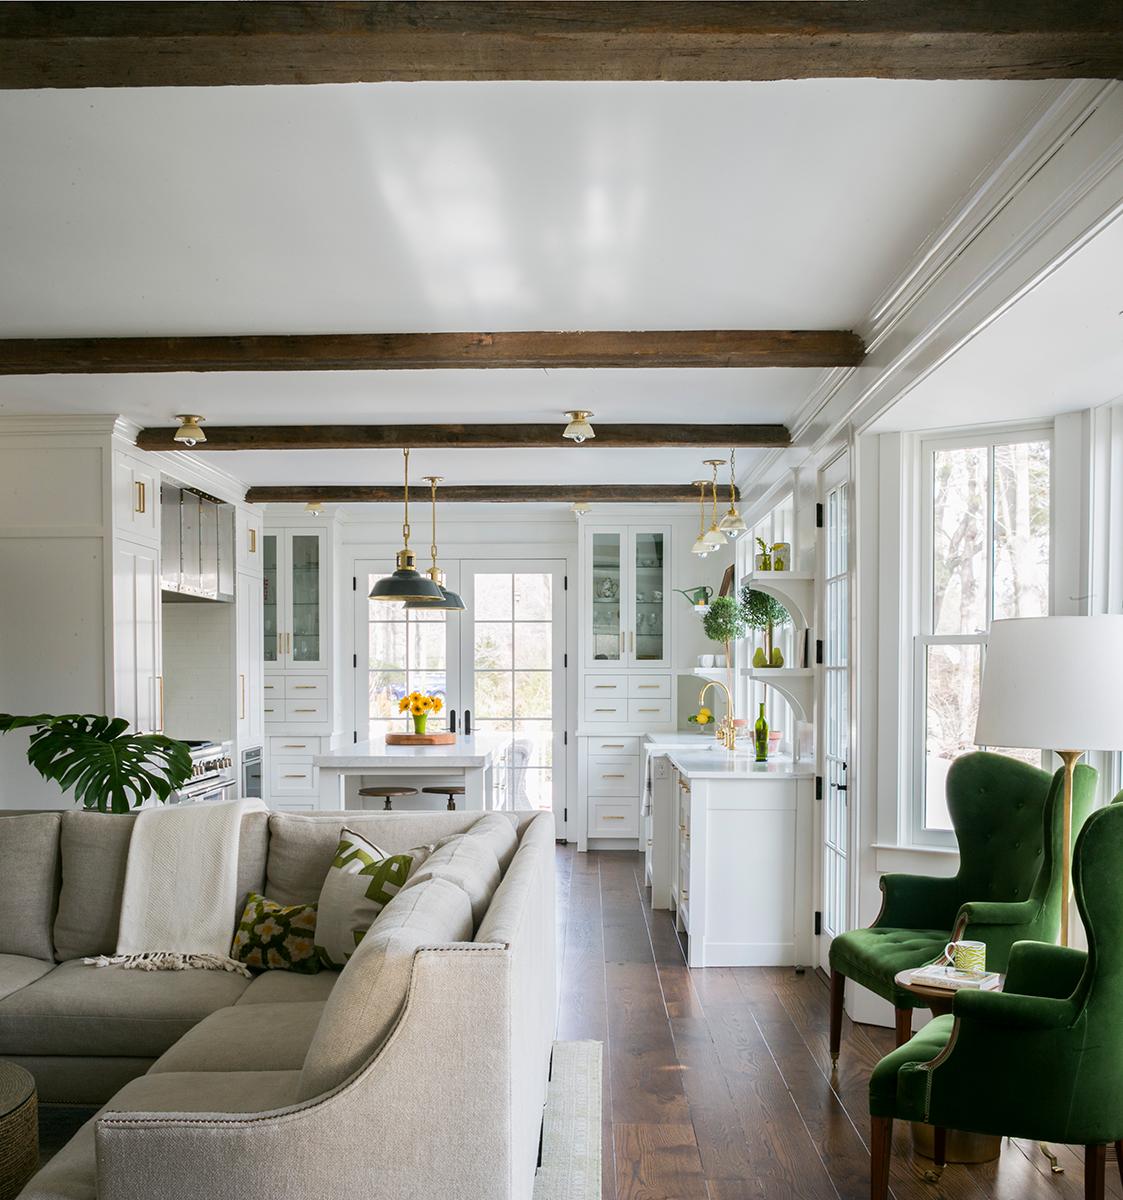 Carol flanagan design greenwich ct interior design for Greenwich ct interior designers